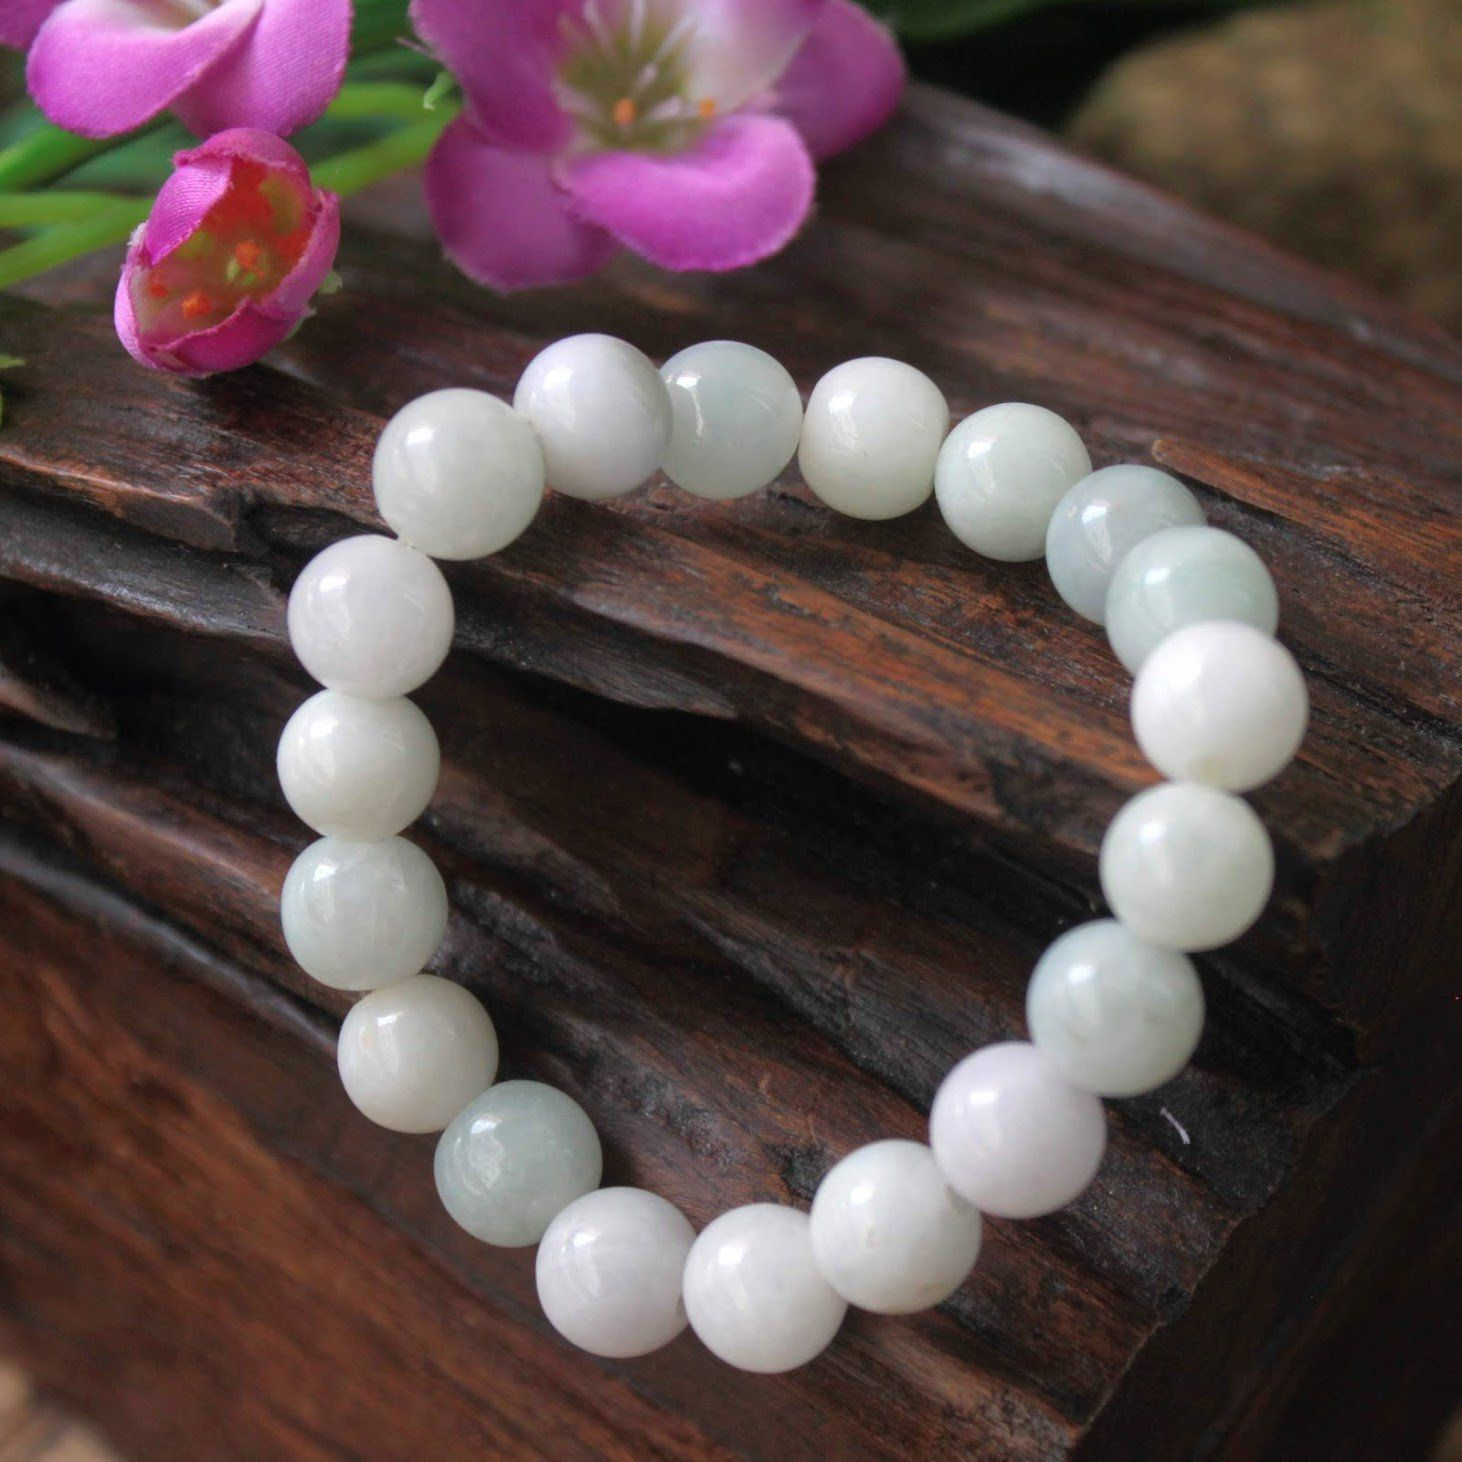 10X womens fashion heart charm chain bead Gold bangle bracelet Free Shipping WT